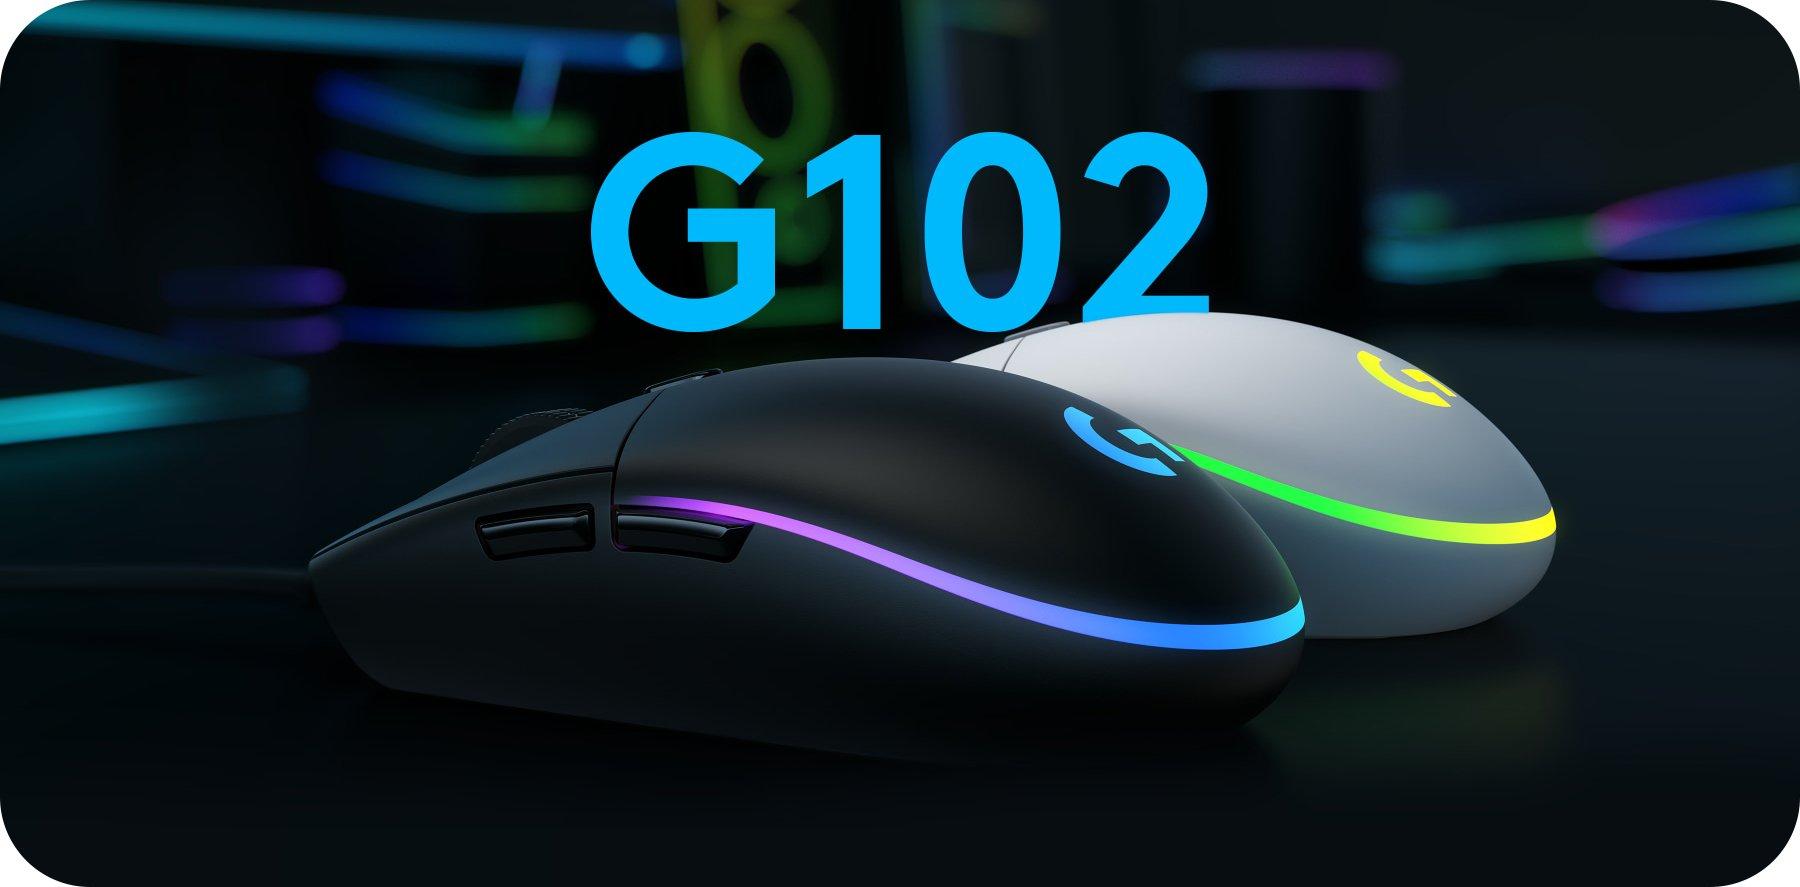 Logitech Gaming Mouse G102 Gen Lightsync Black